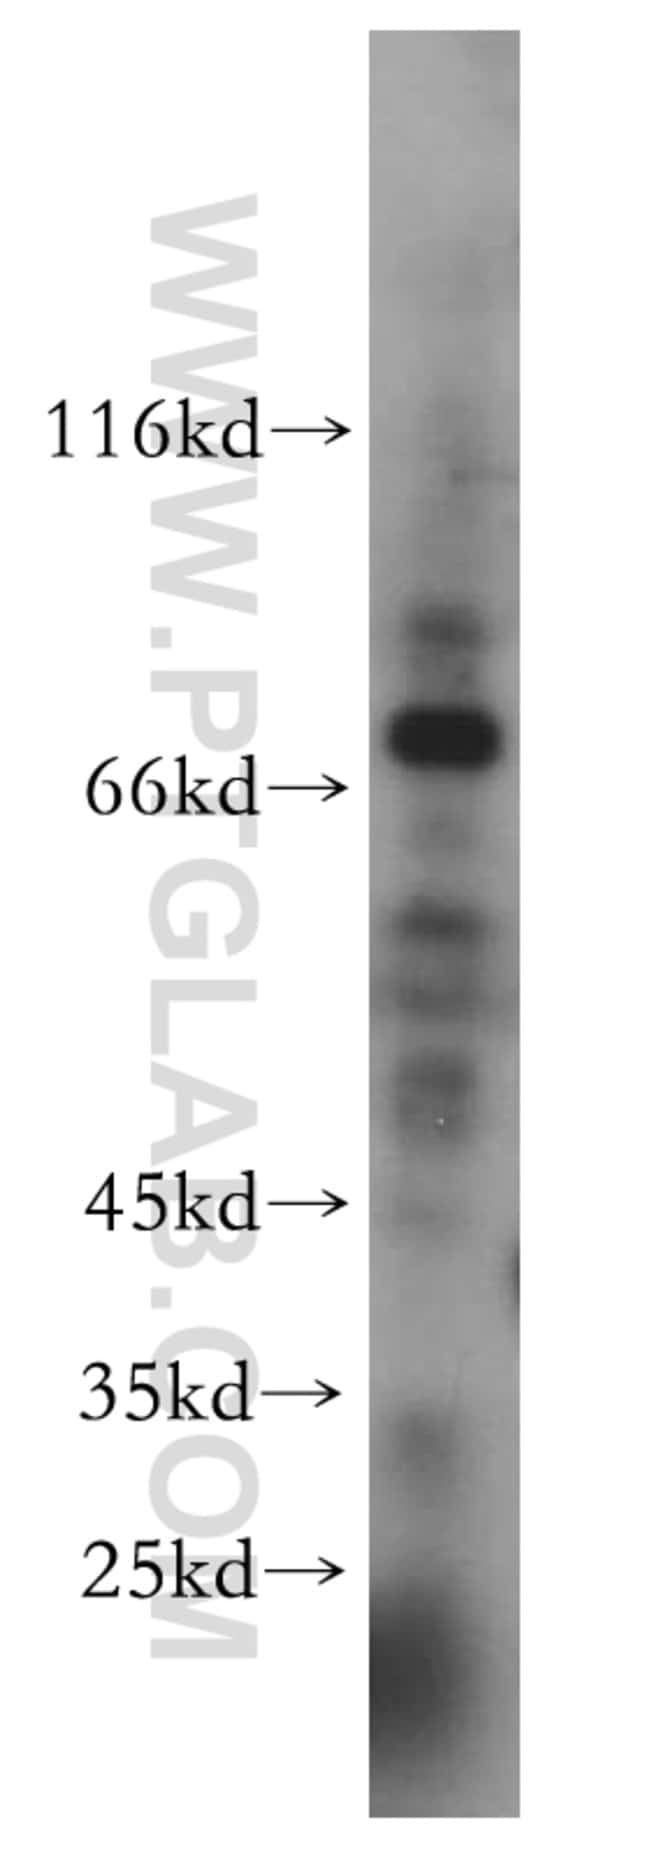 CDK5RAP1 Rabbit anti-Human, Mouse, Rat, Polyclonal, Proteintech 20 μL; Unconjugated Produkte